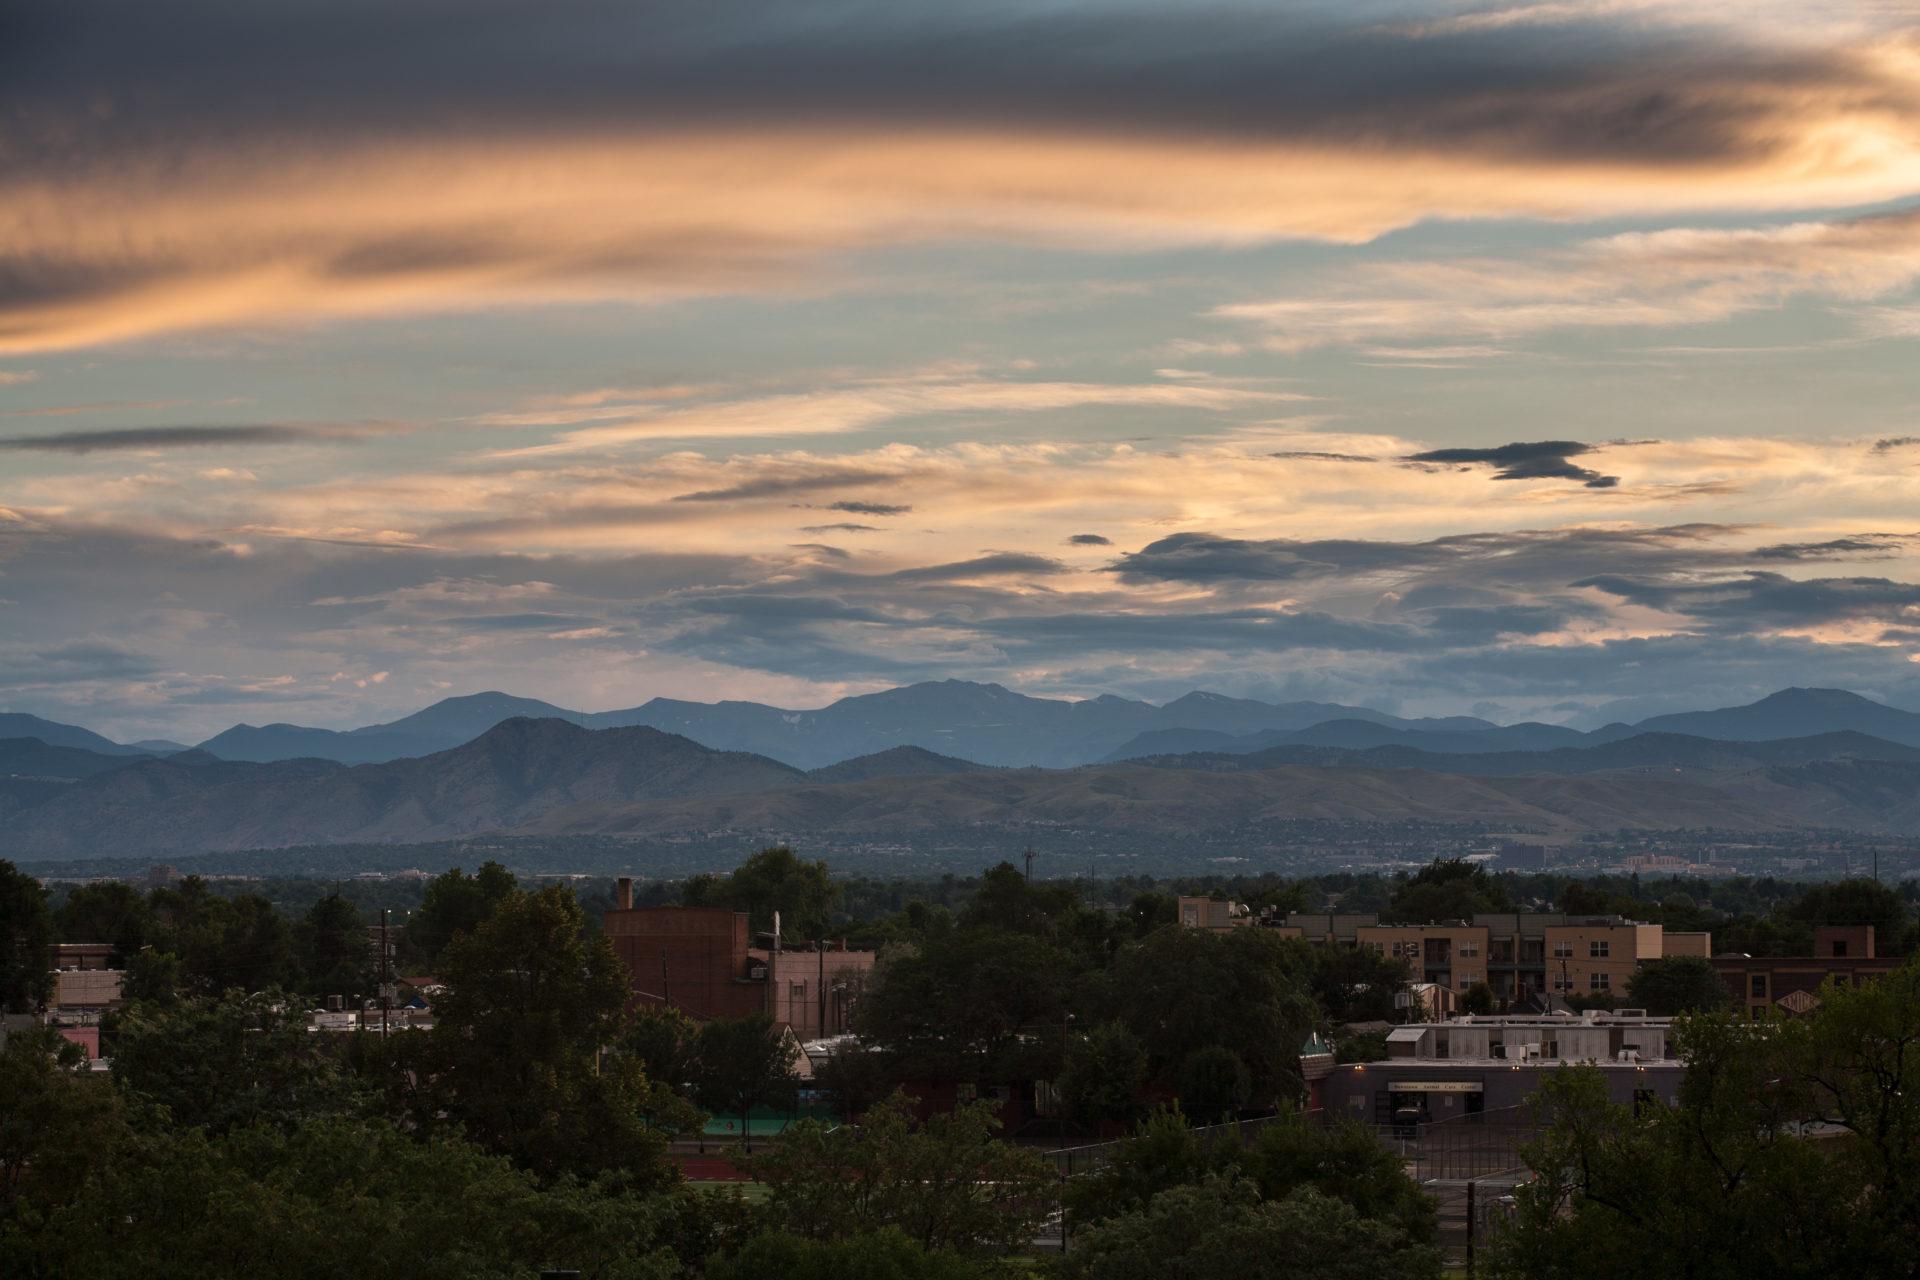 Mount Evans sunset - August 3, 2011